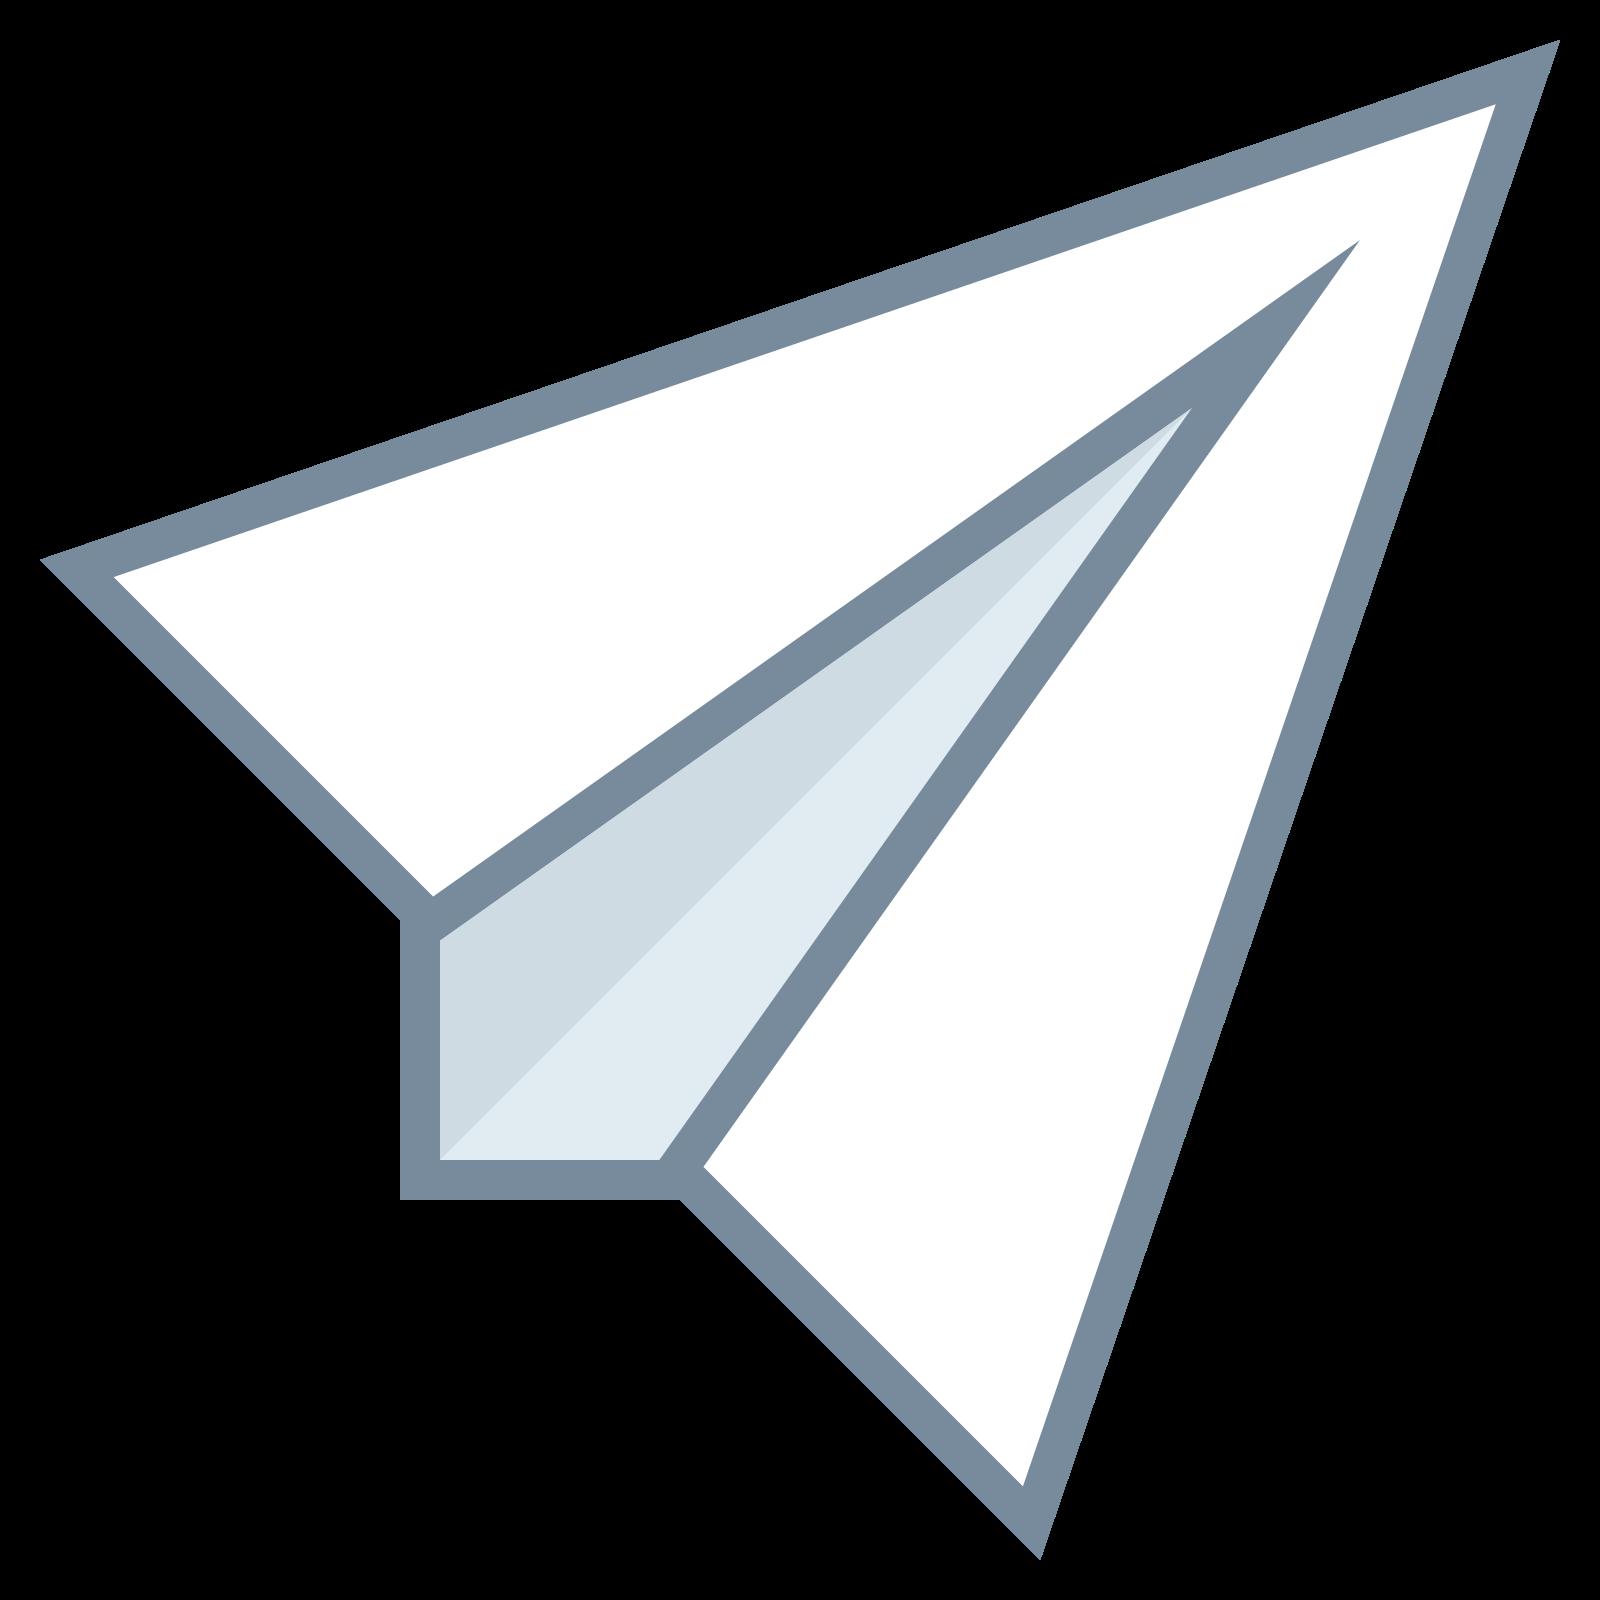 Avion en papier icon